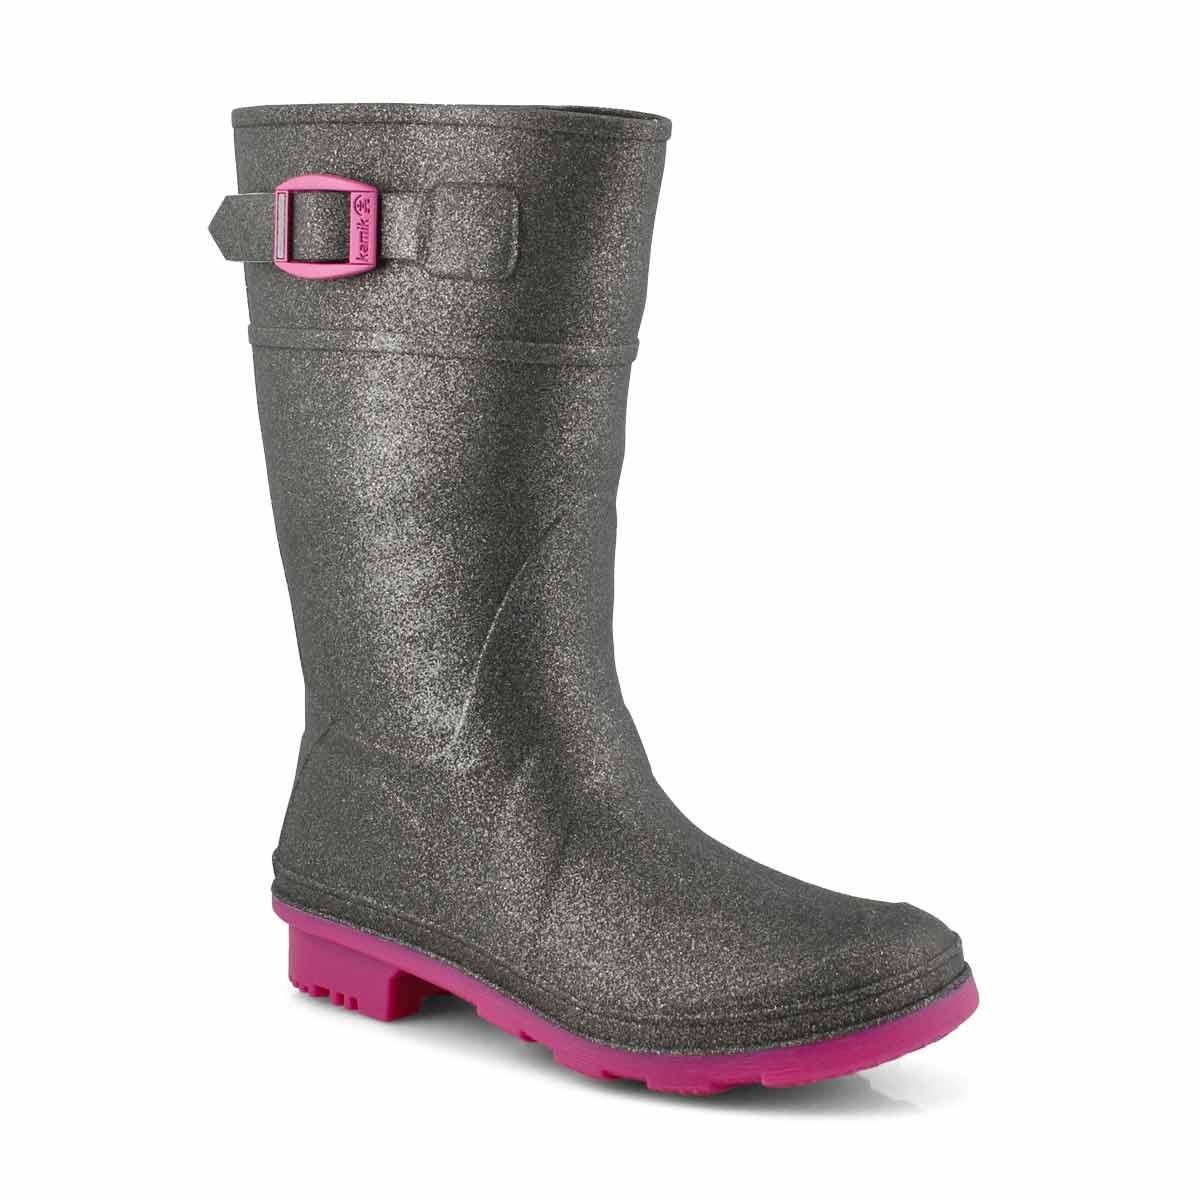 Girls' GLITZY charcoal waterproof rain boots